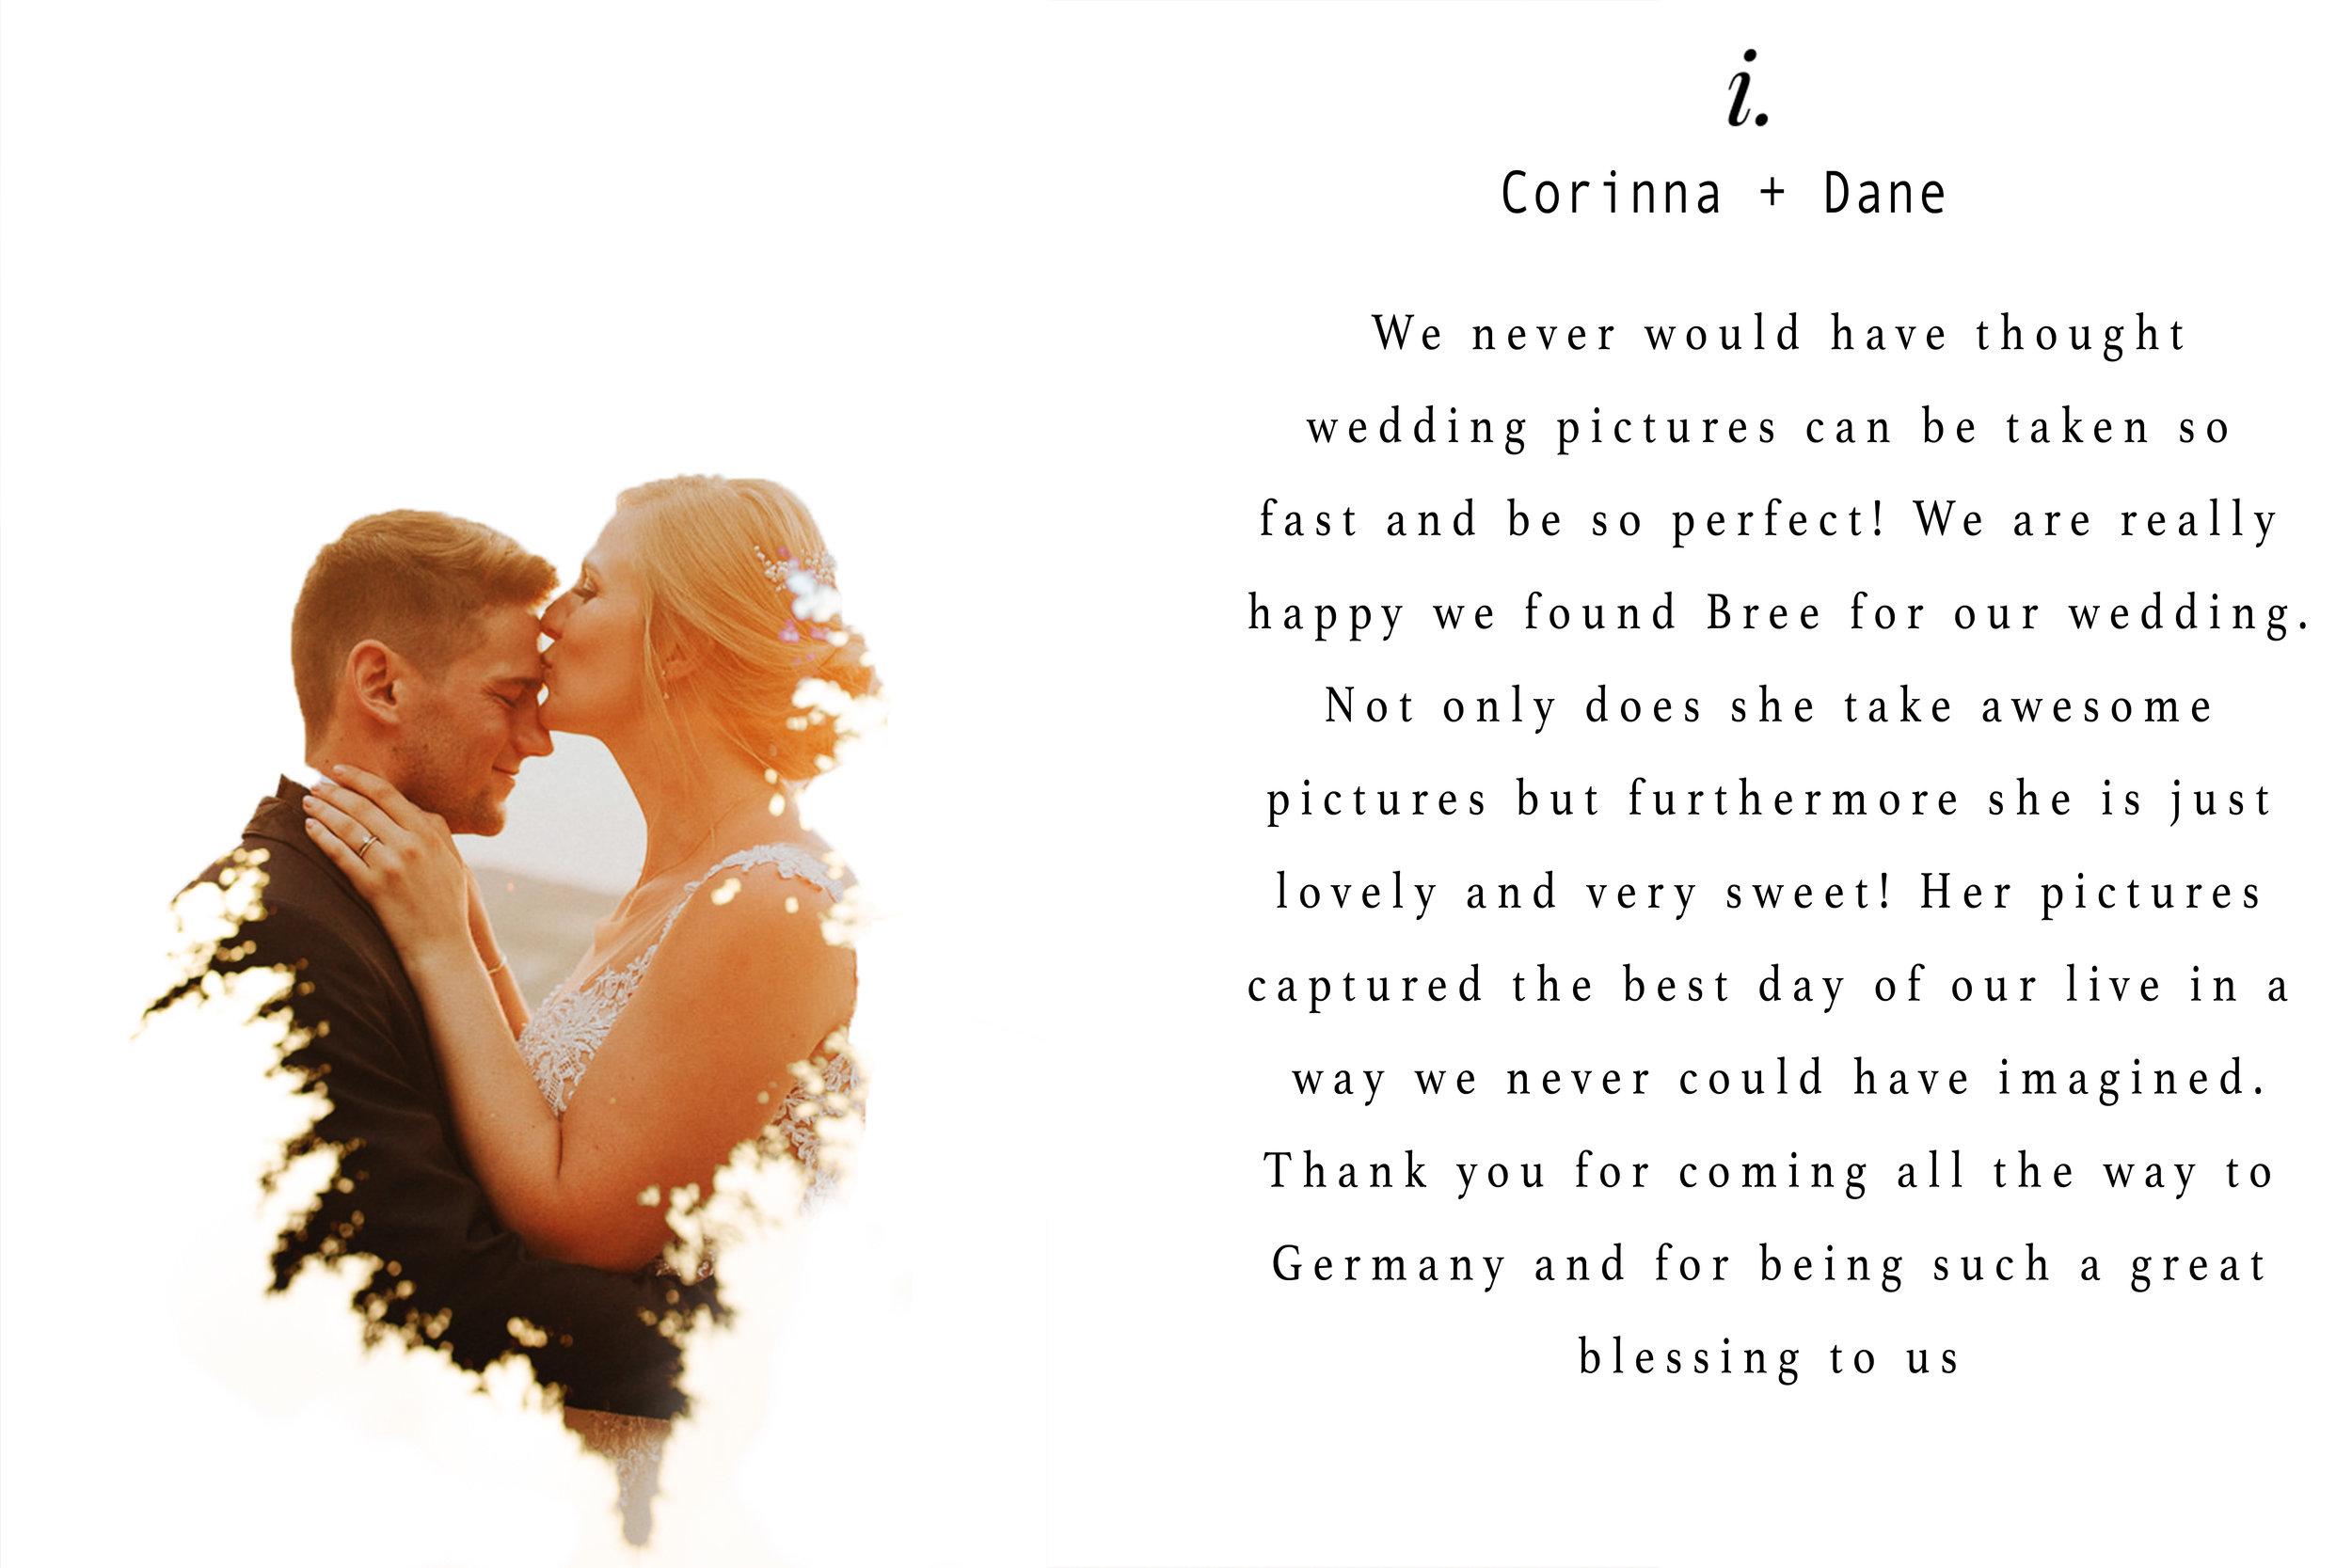 Mount-baker-artist-point-elopement-Ceremony-review 5.jpg